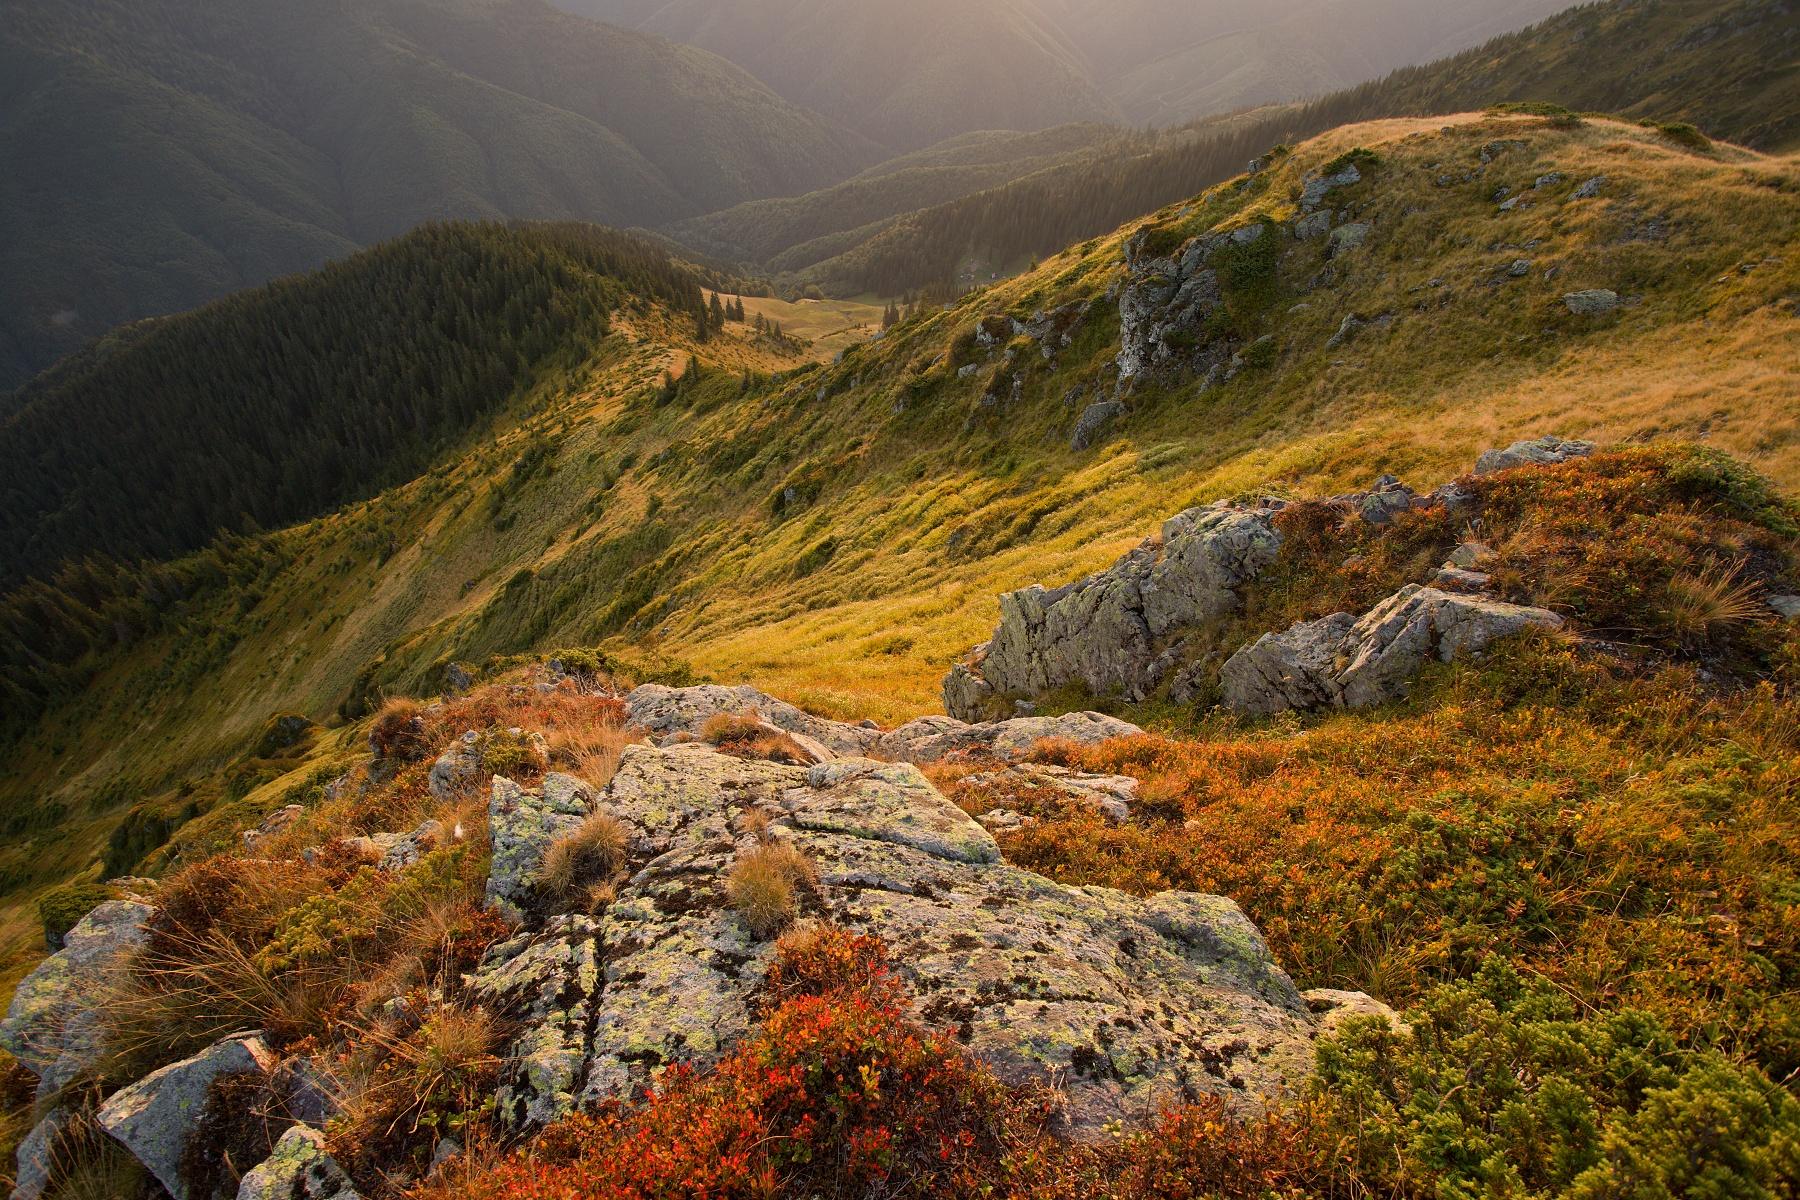 Mihailecu, Munții Maramureșului, Romania Canon EOS 6d mark II + Canon 17-40mm, 17mm, 1/20, f10, ISO 250, 22. september 2020